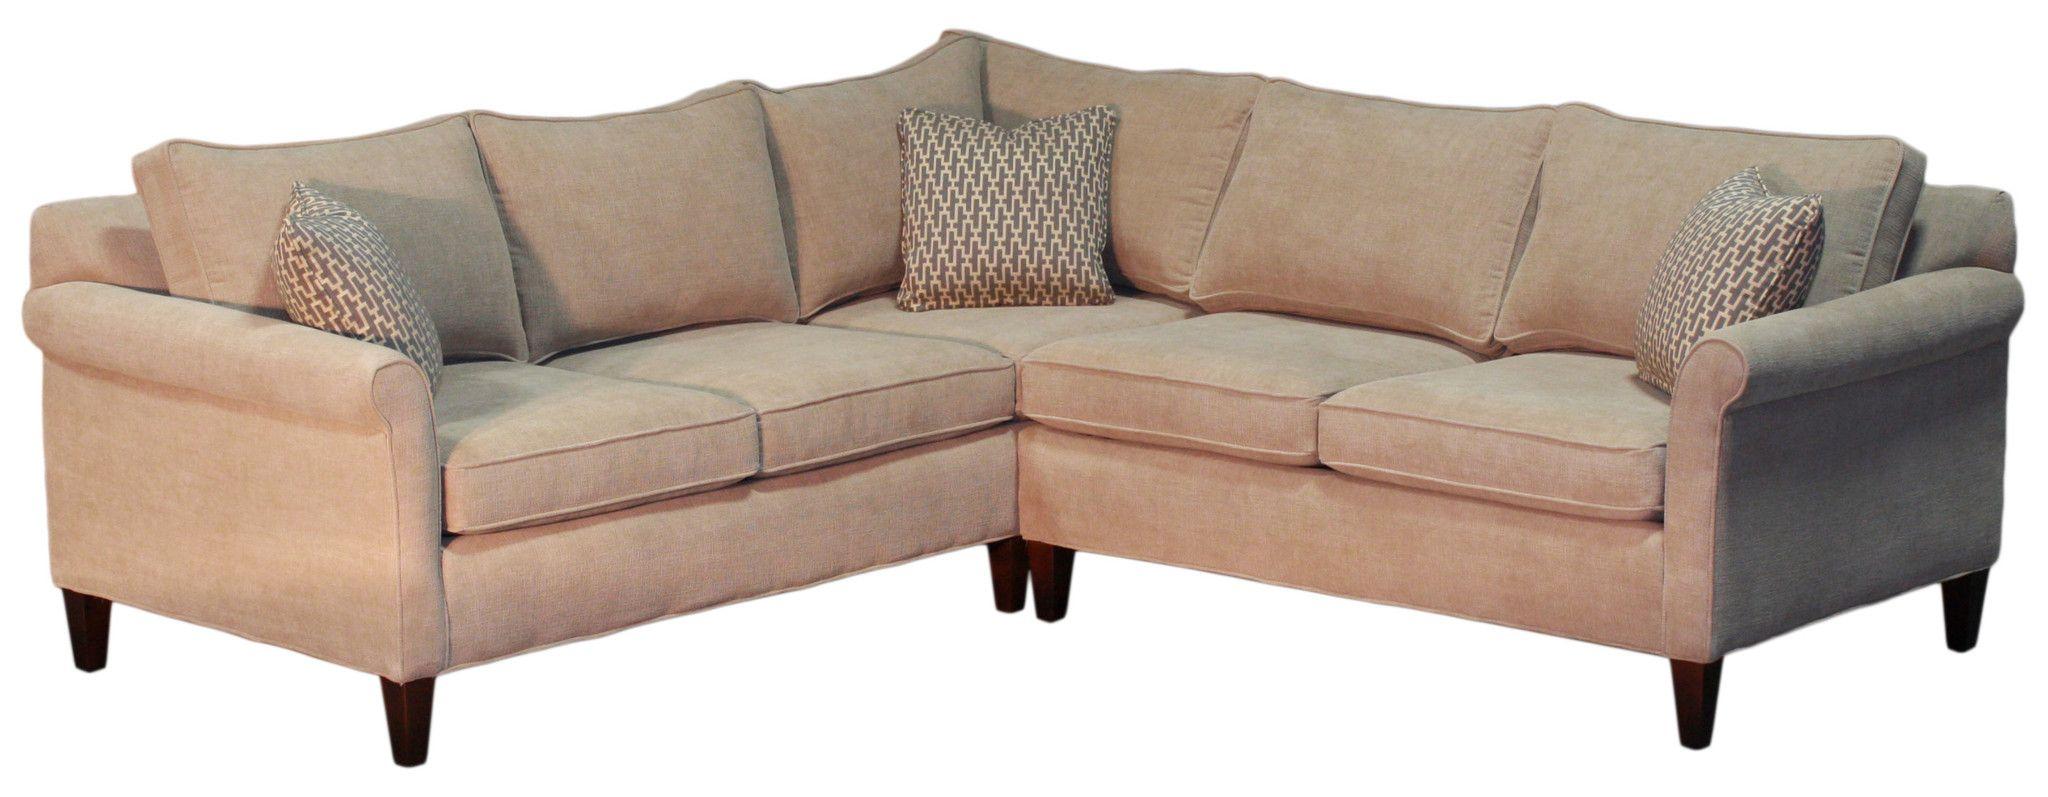 Compact Non Toxic Oscar Sectional 2 Endicott Home Furnishings